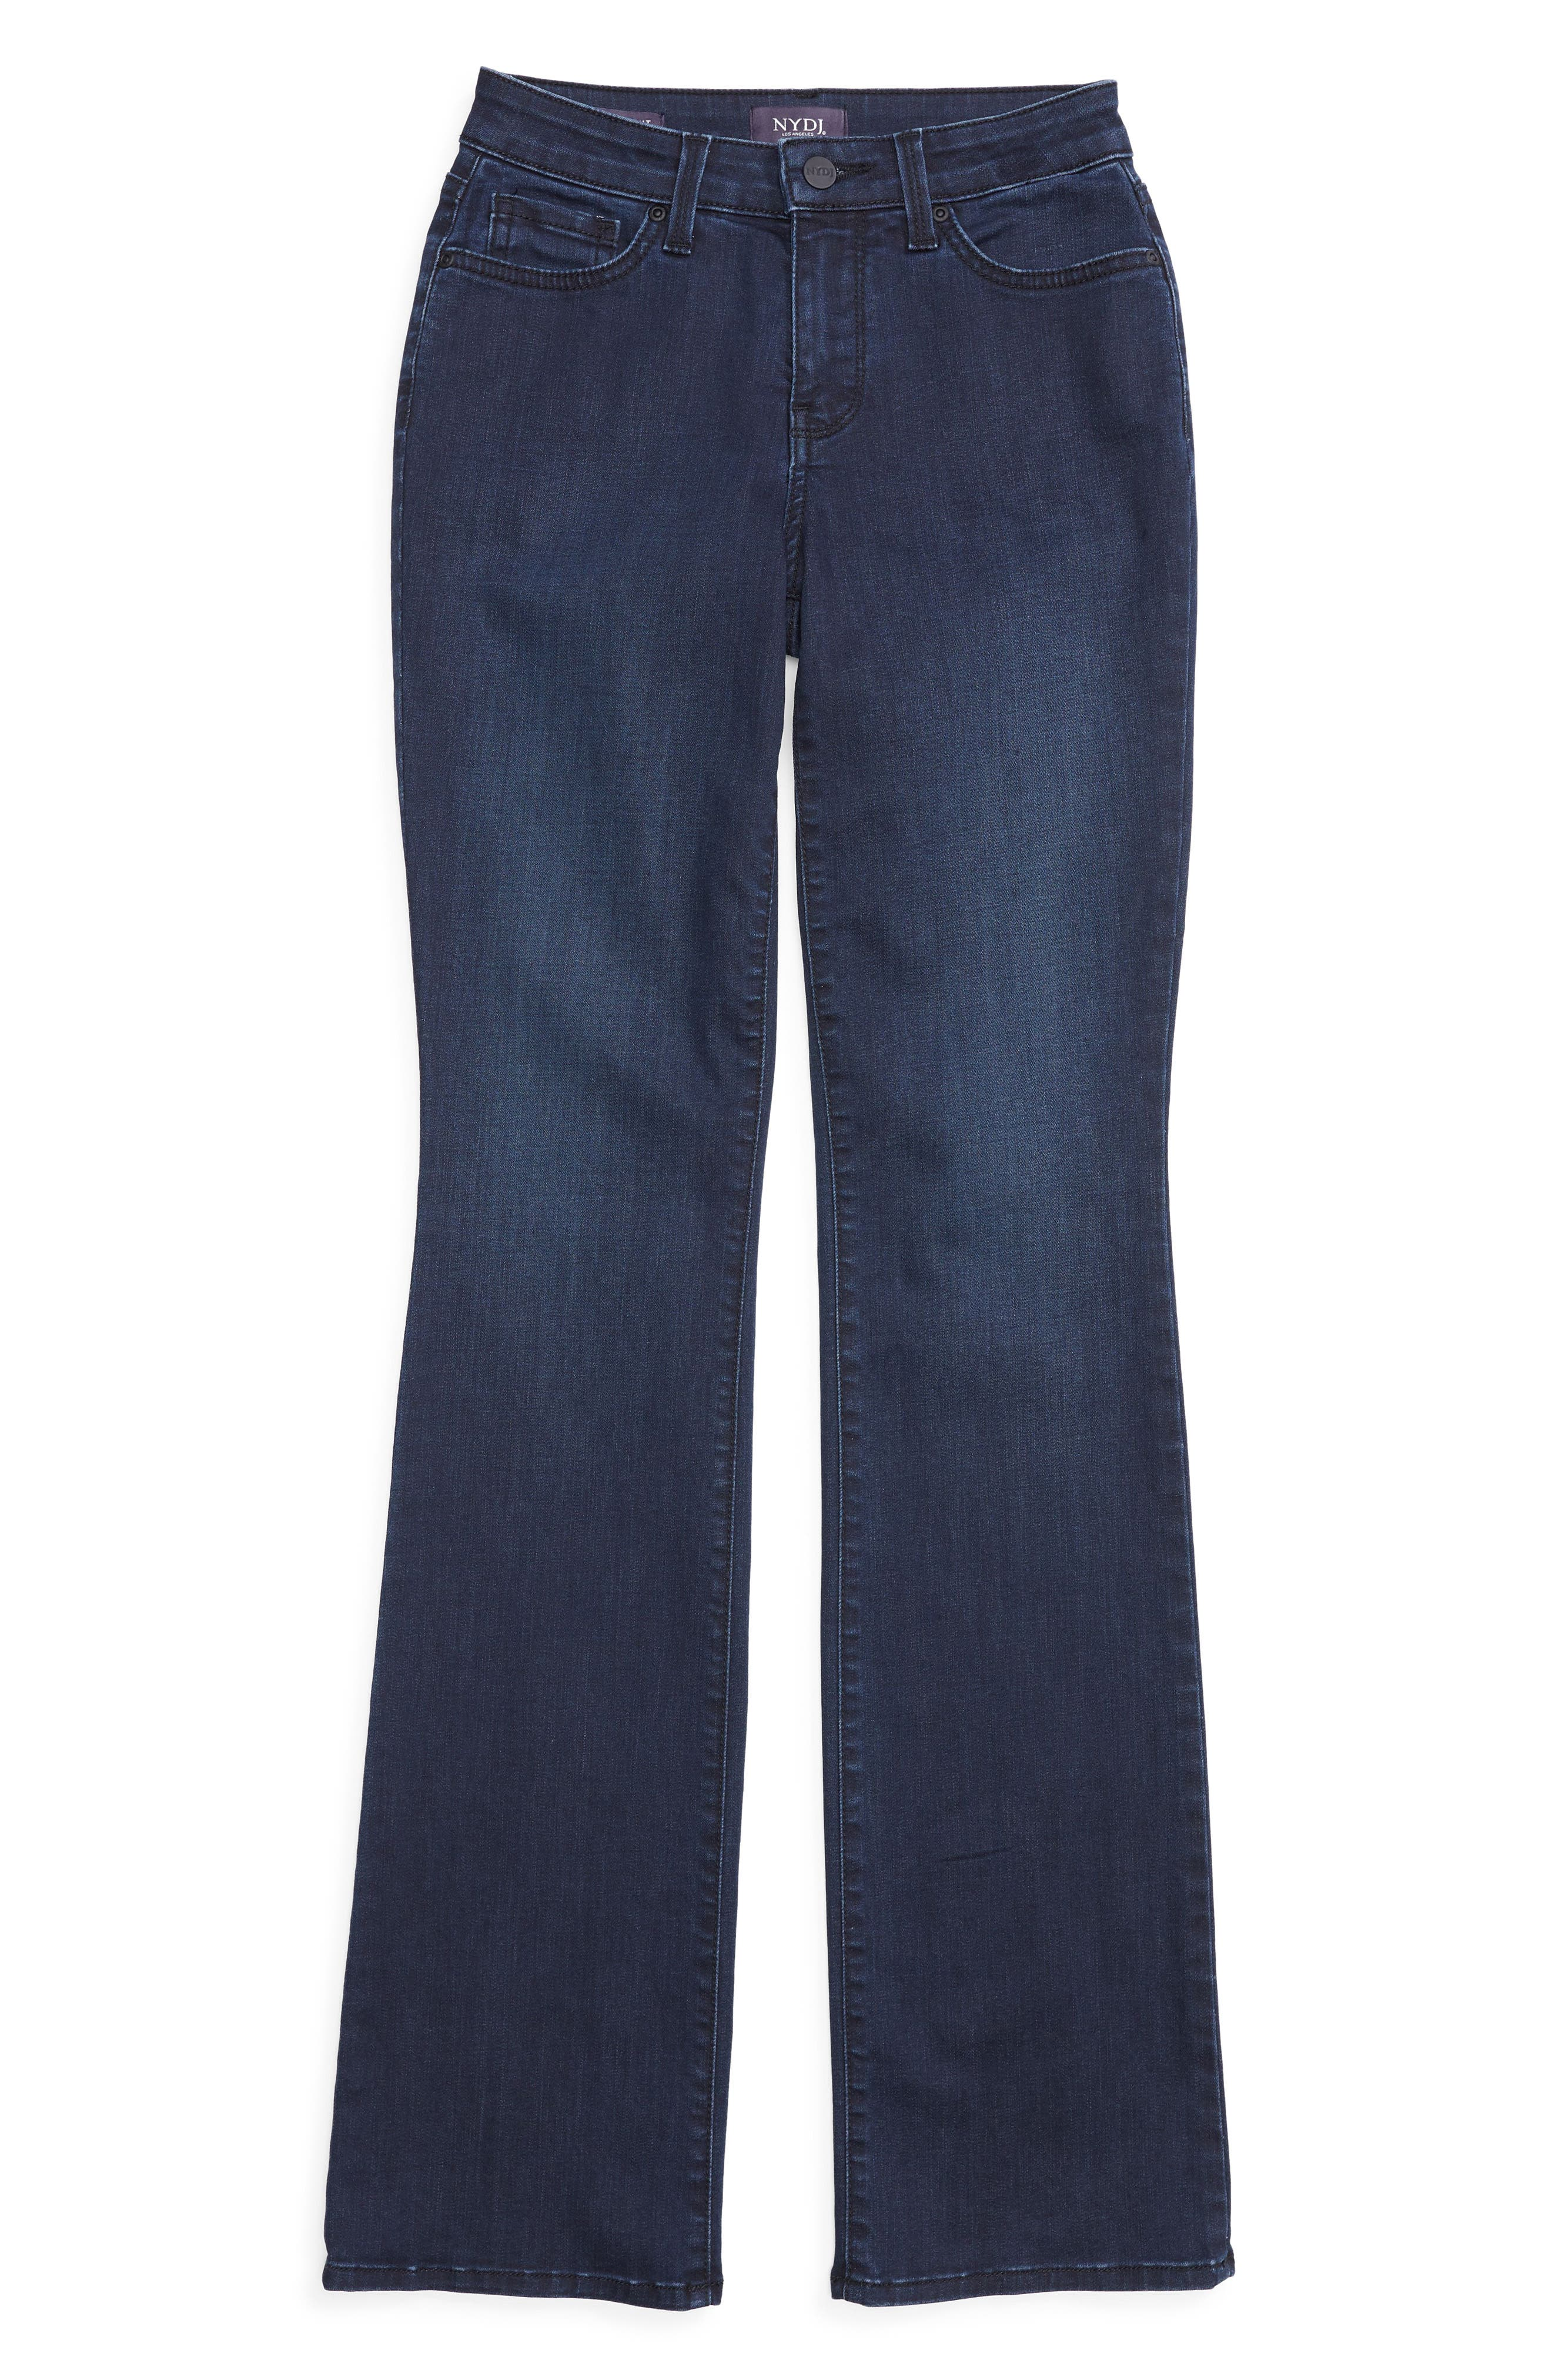 Barbara Stretch Bootcut Jeans,                             Alternate thumbnail 4, color,                             FALLEN